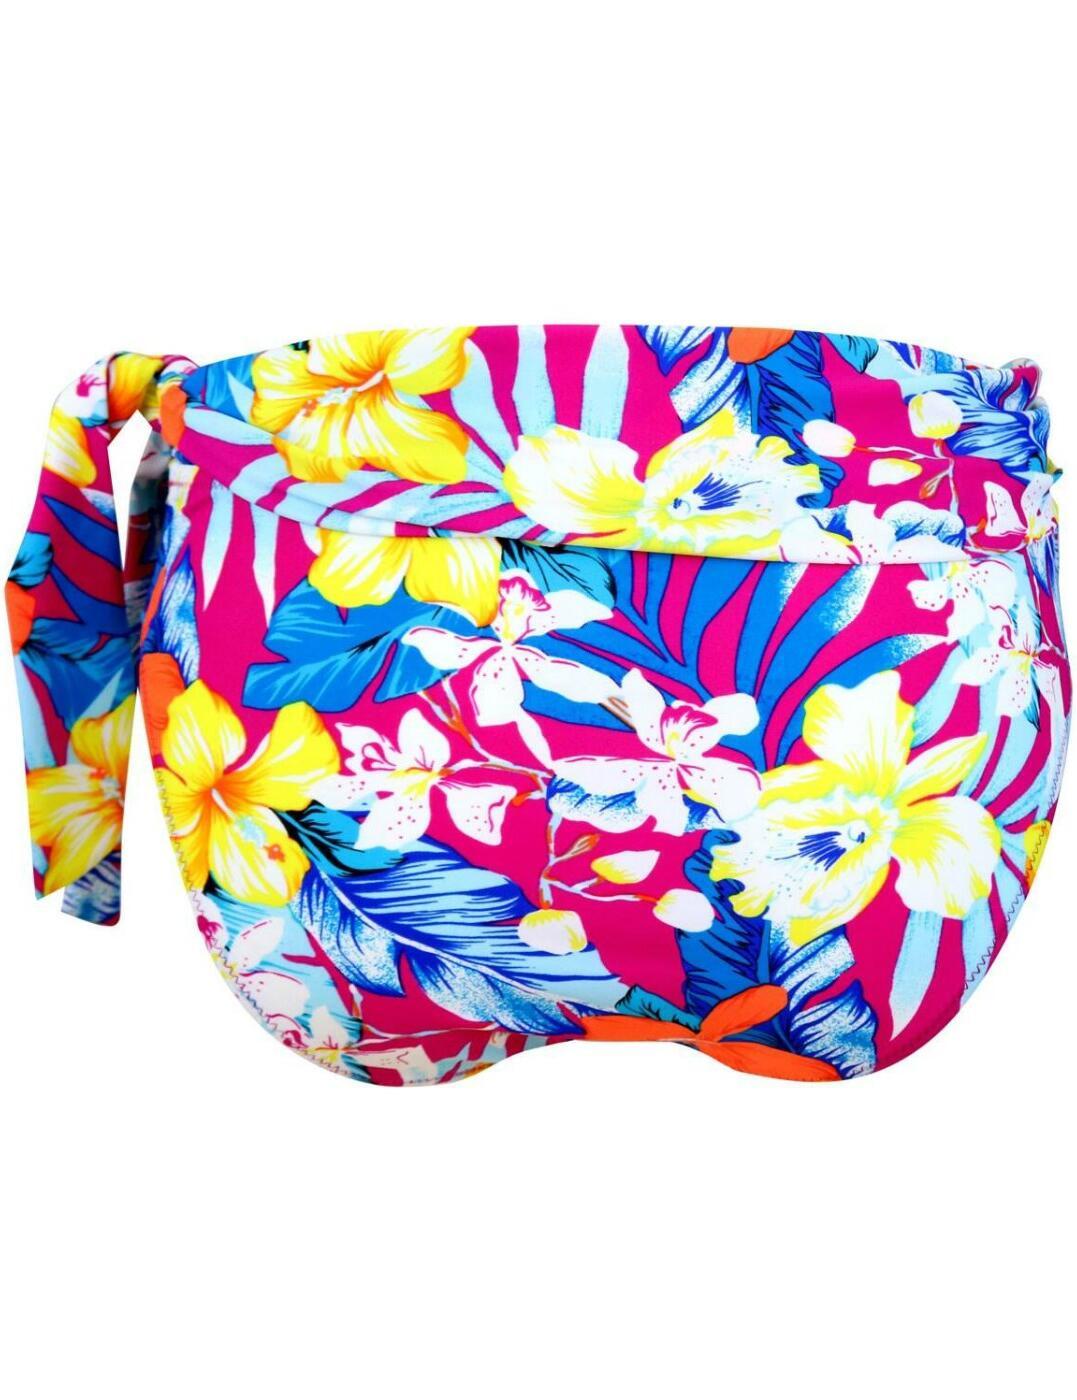 Pour-Moi-Heatwave-Fold-Over-Bikini-Brief-Bottoms-86003-New-Womens-Swimwear thumbnail 4